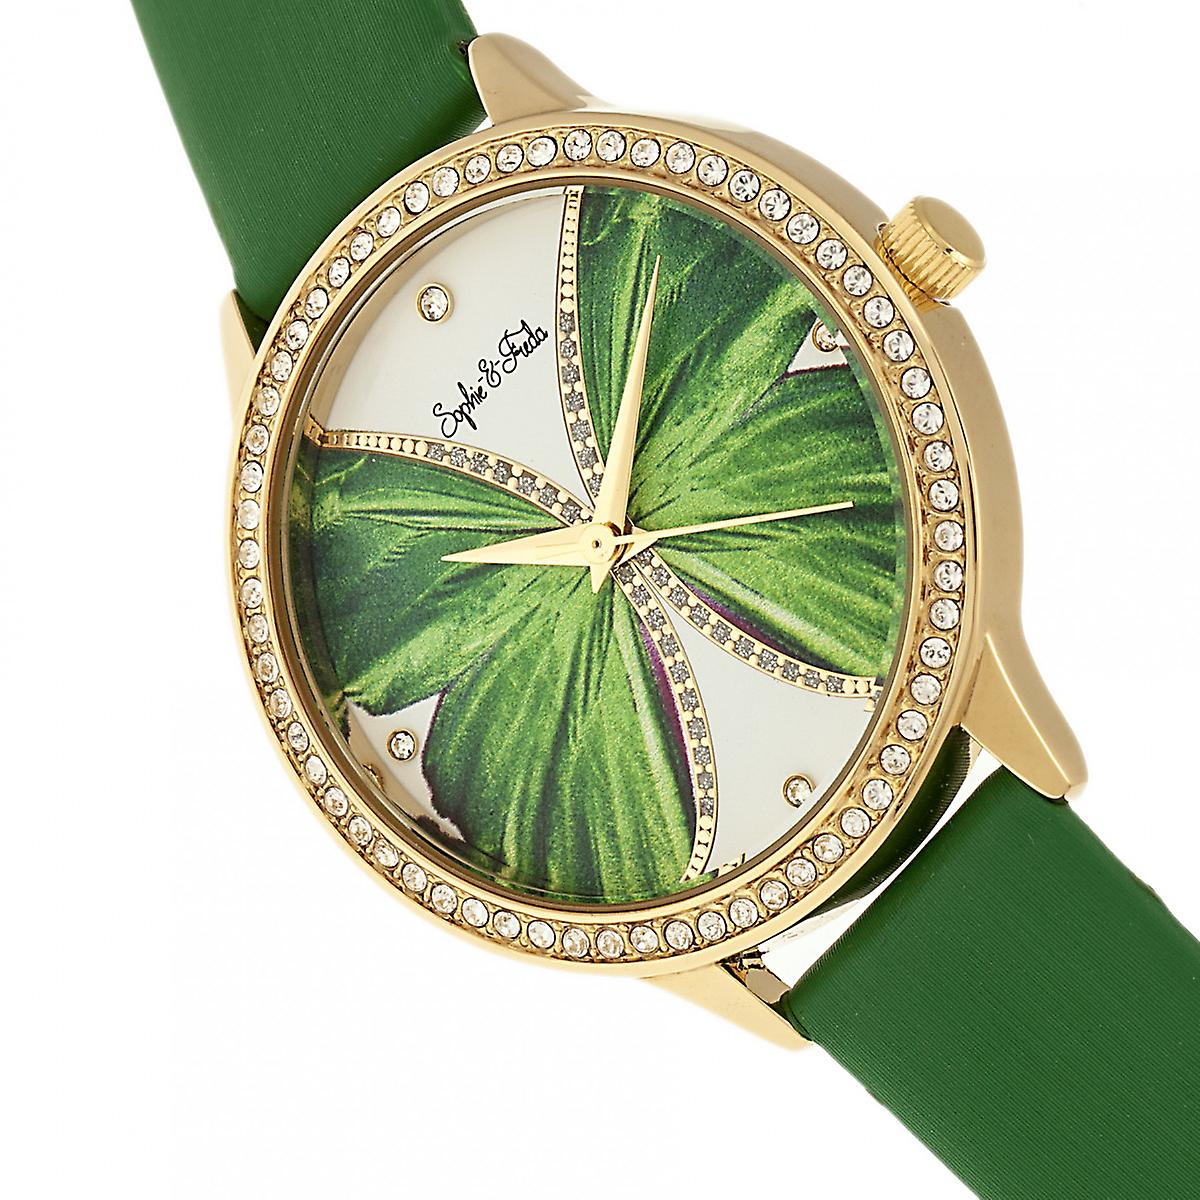 Sophie & Freda Rio Grande Leather-Band w/Swarovski Crystals - Gold/Green